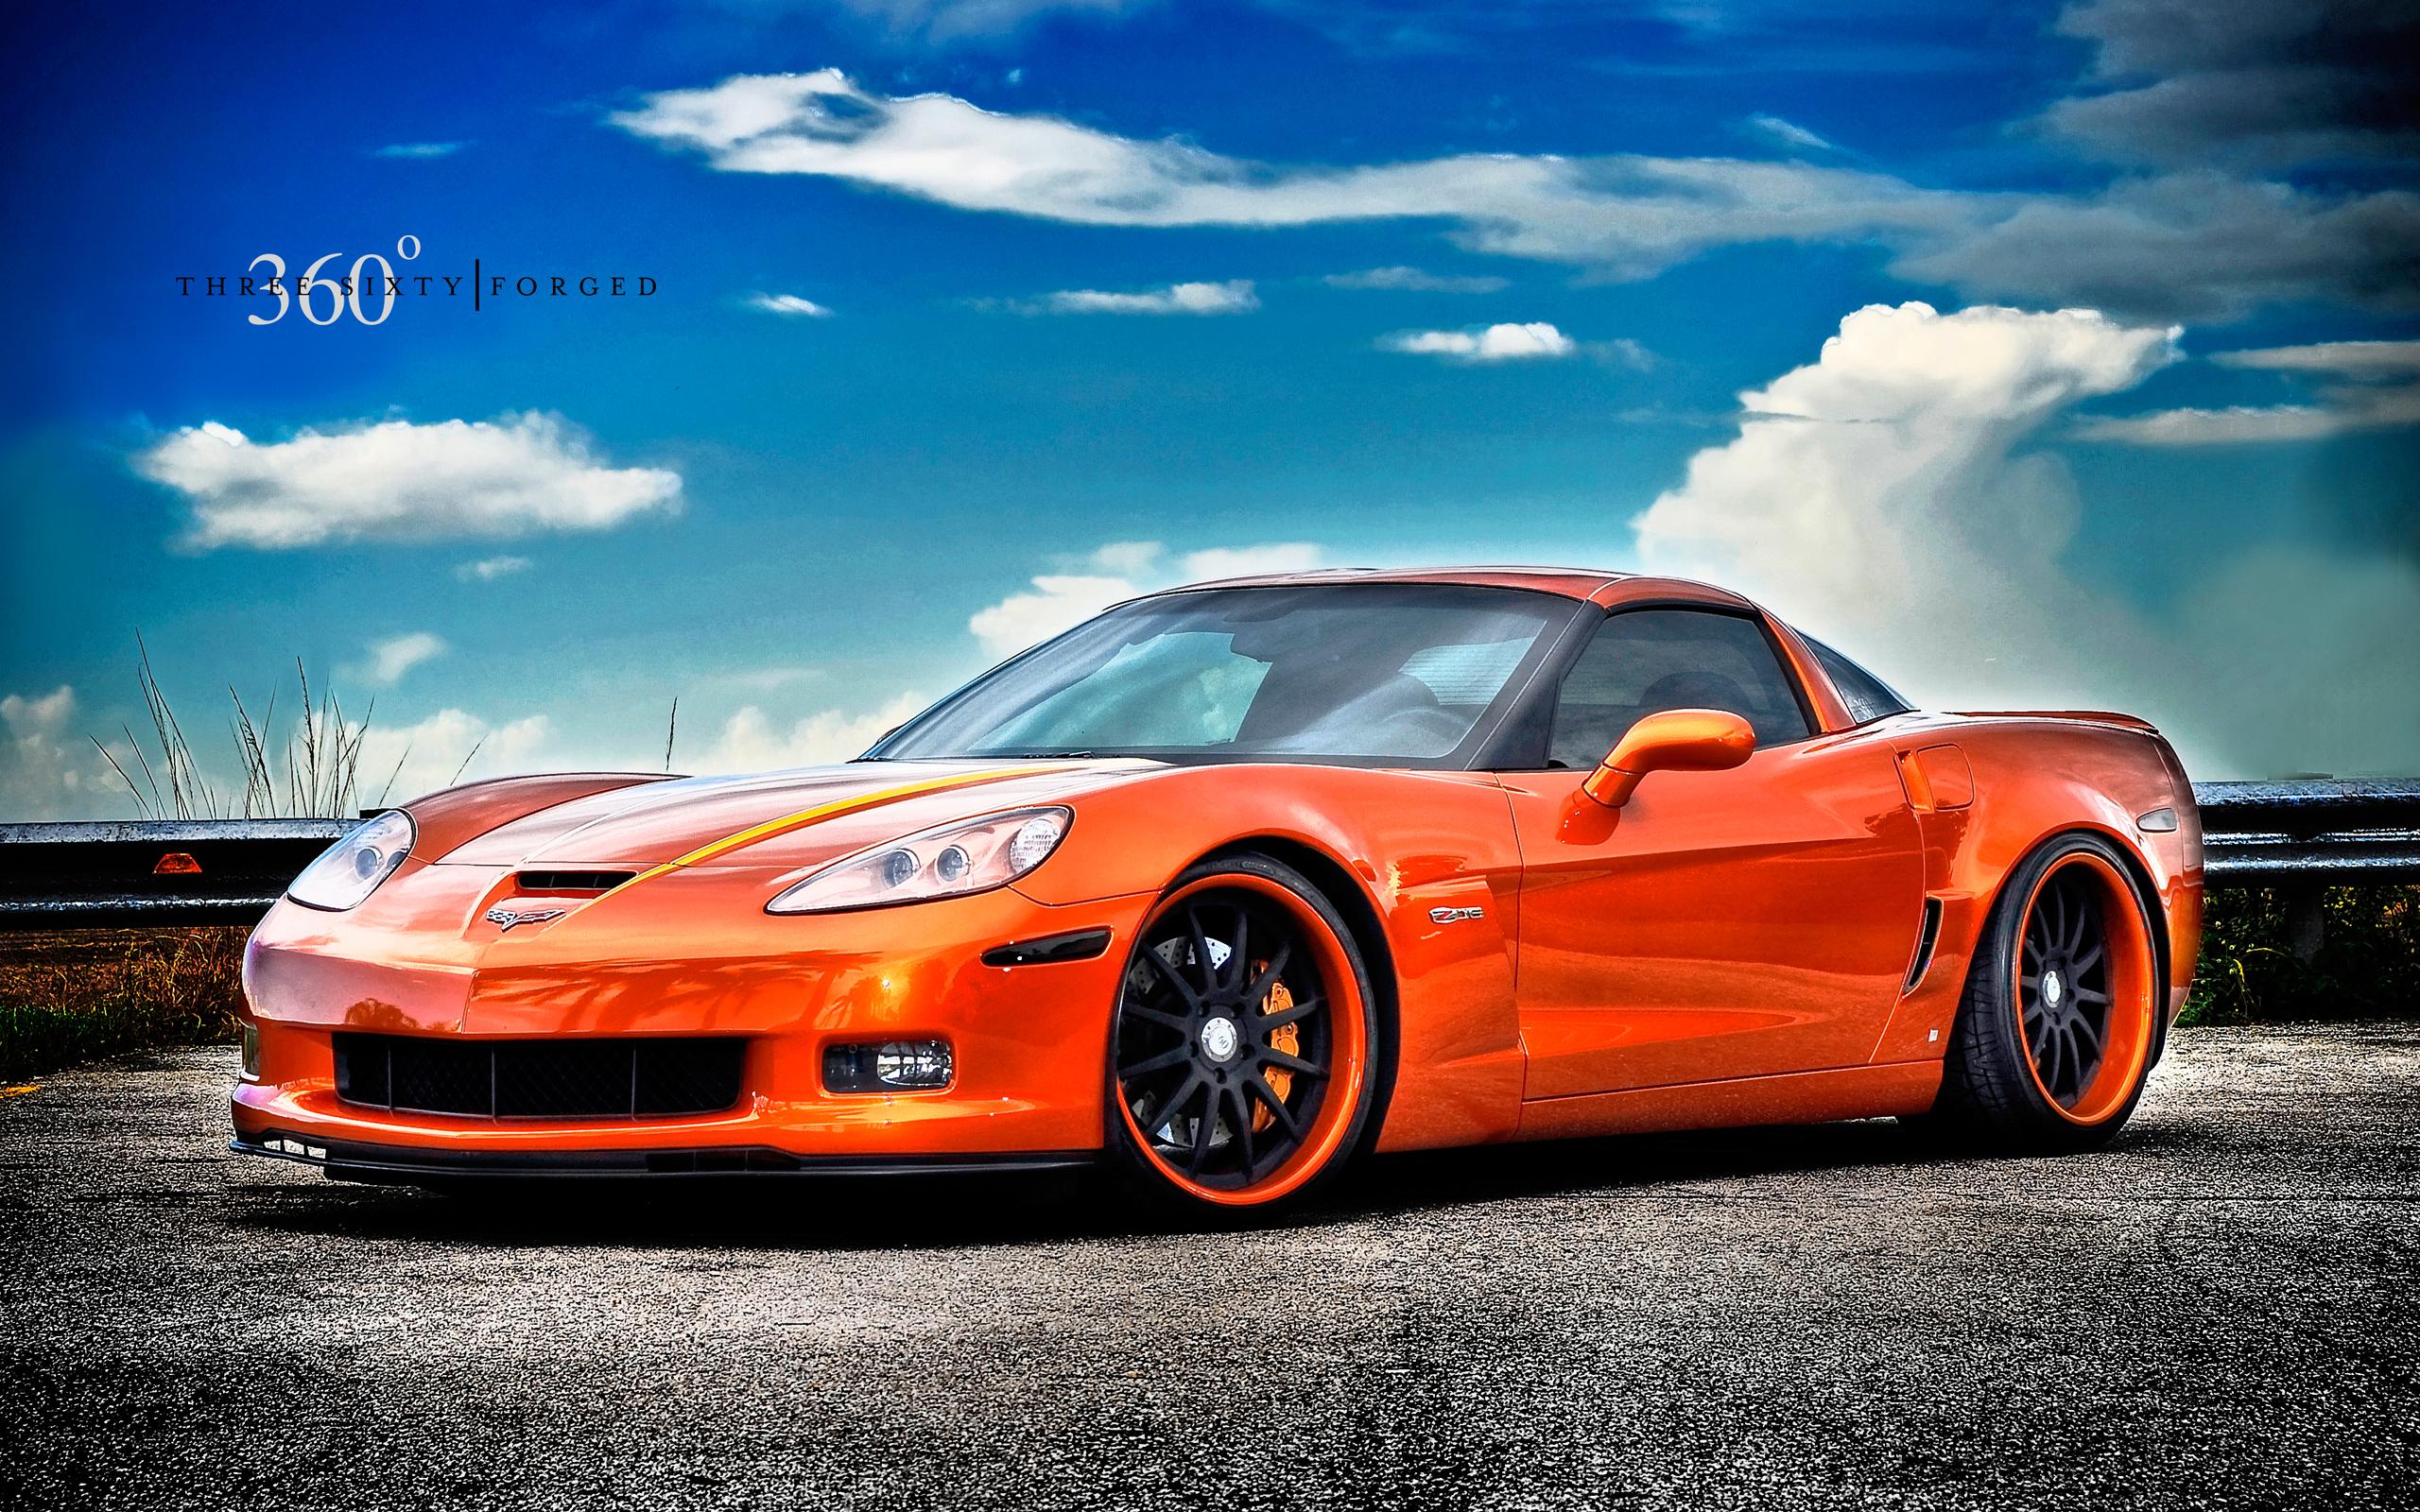 Corvette Z06 On 360 Forged Wheels Wallpaper Hd Car Wallpapers Id